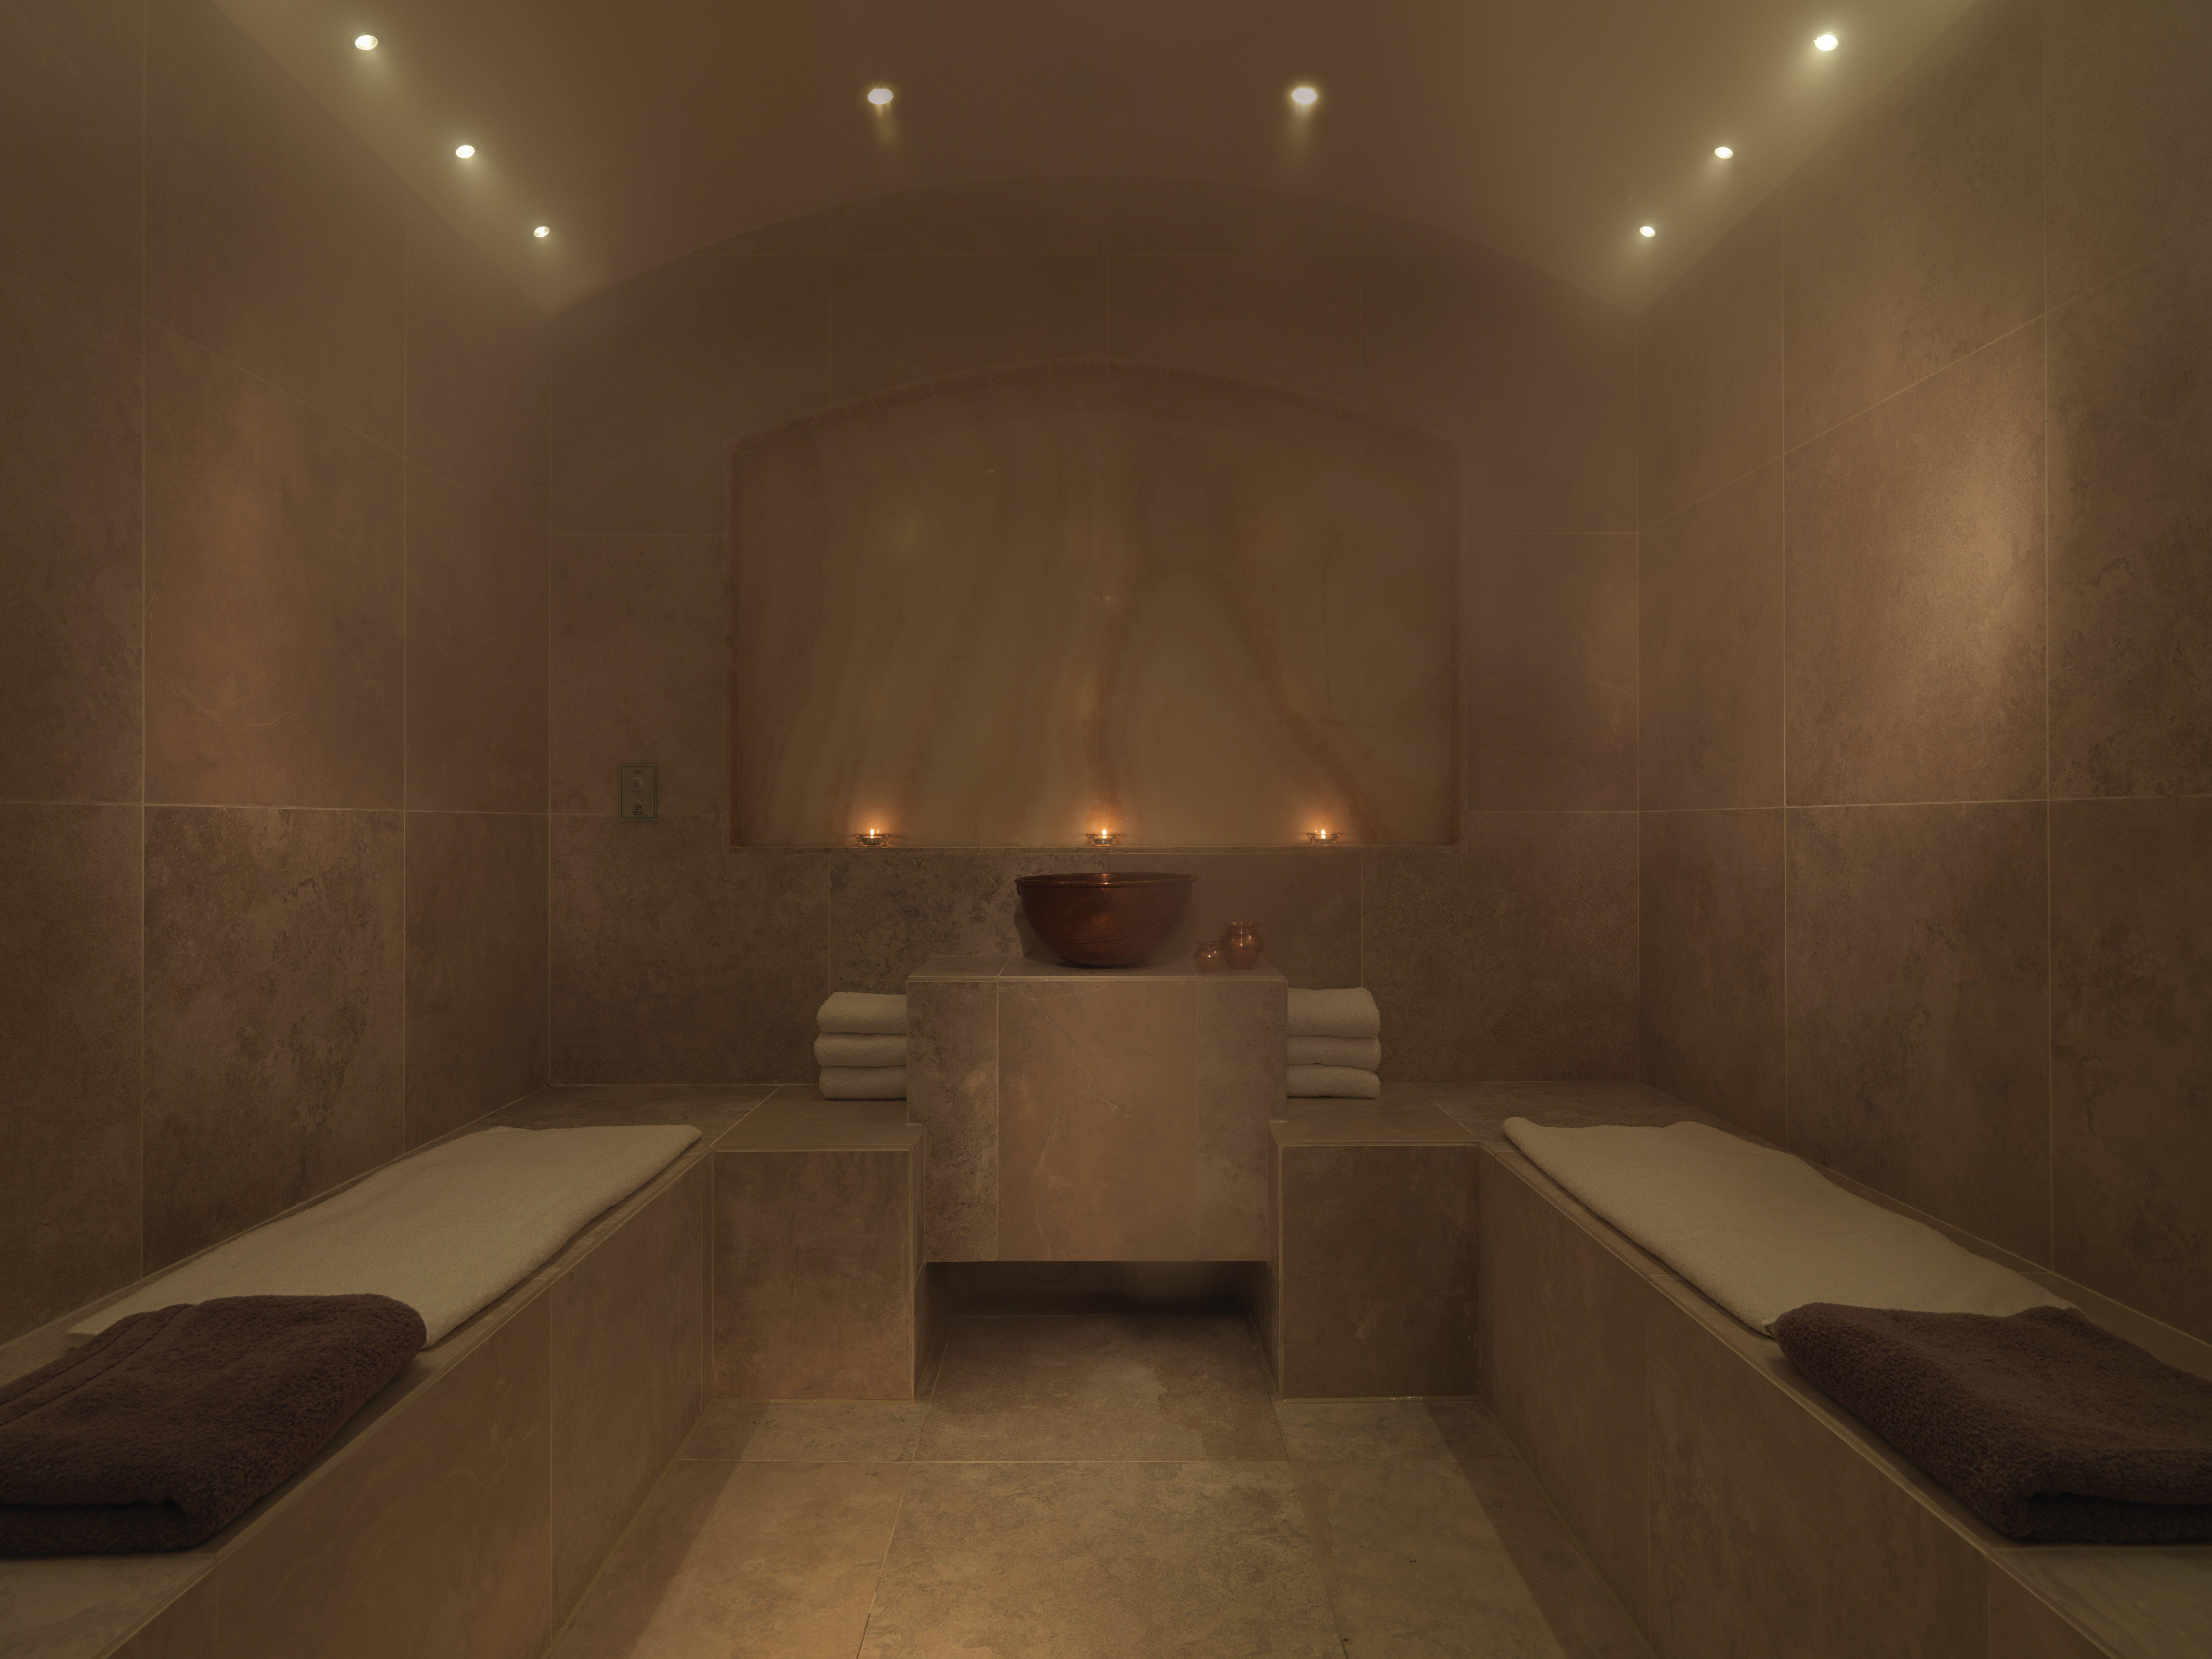 The Salt Infused Steam Room Spa Sw1 Spa In Dolphin Square Hammam Maison Design Moderne De Salles De Bains Idee Salle De Bain